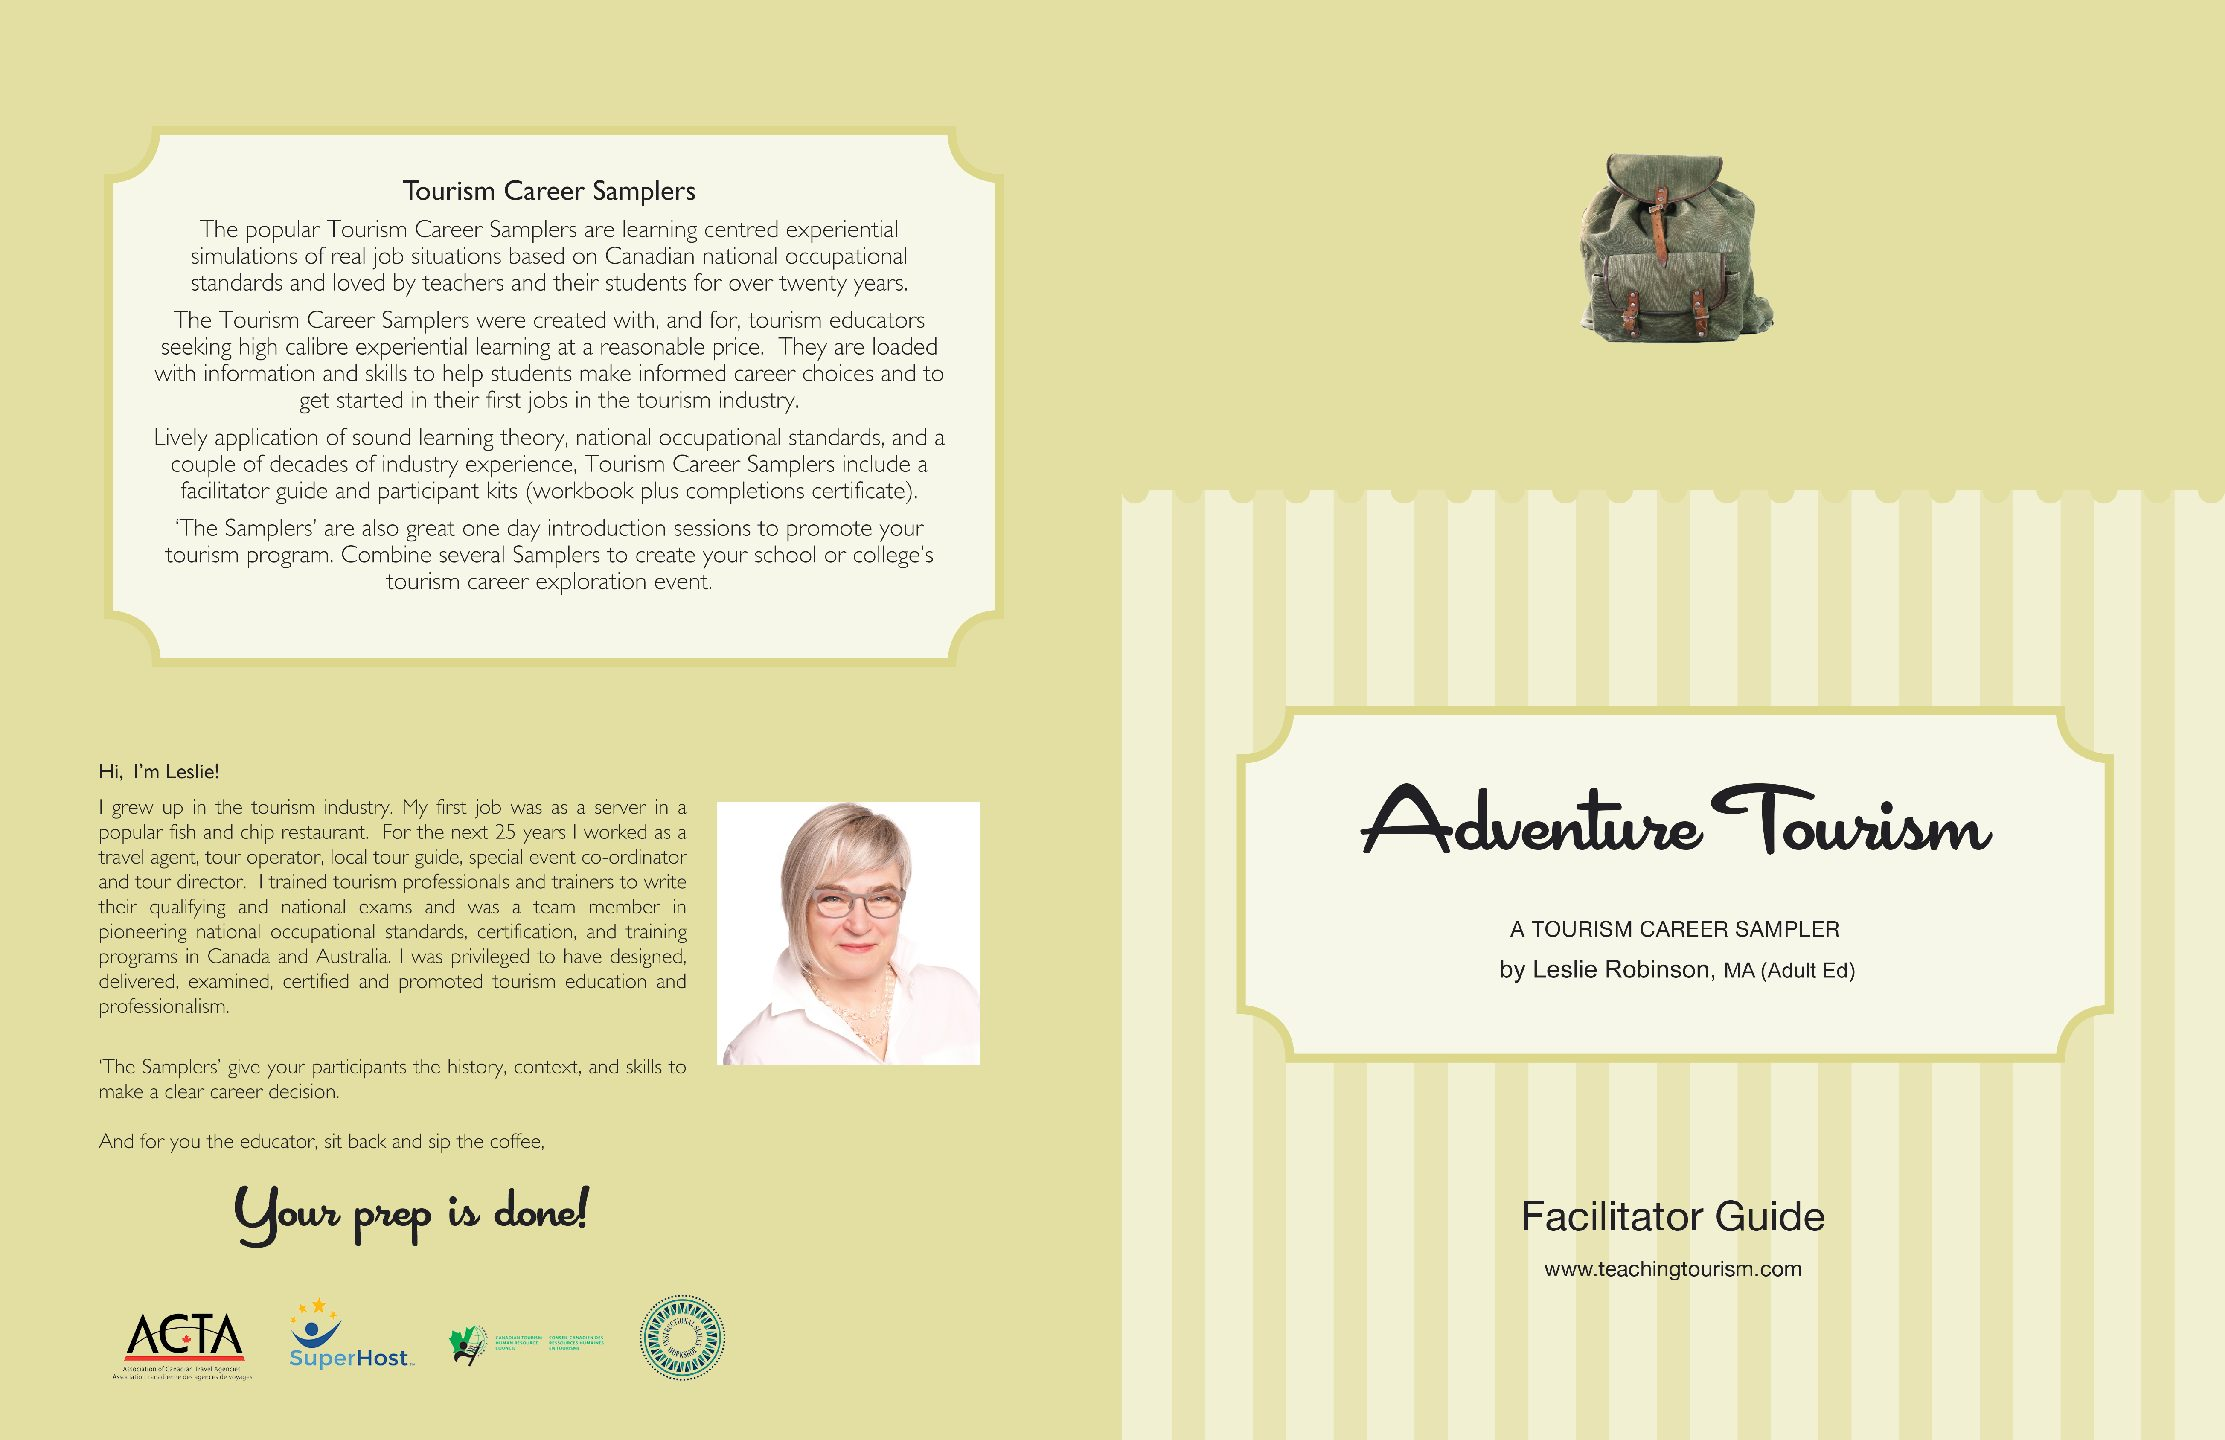 Adventure Tourism Facilitator Guide and Workbook